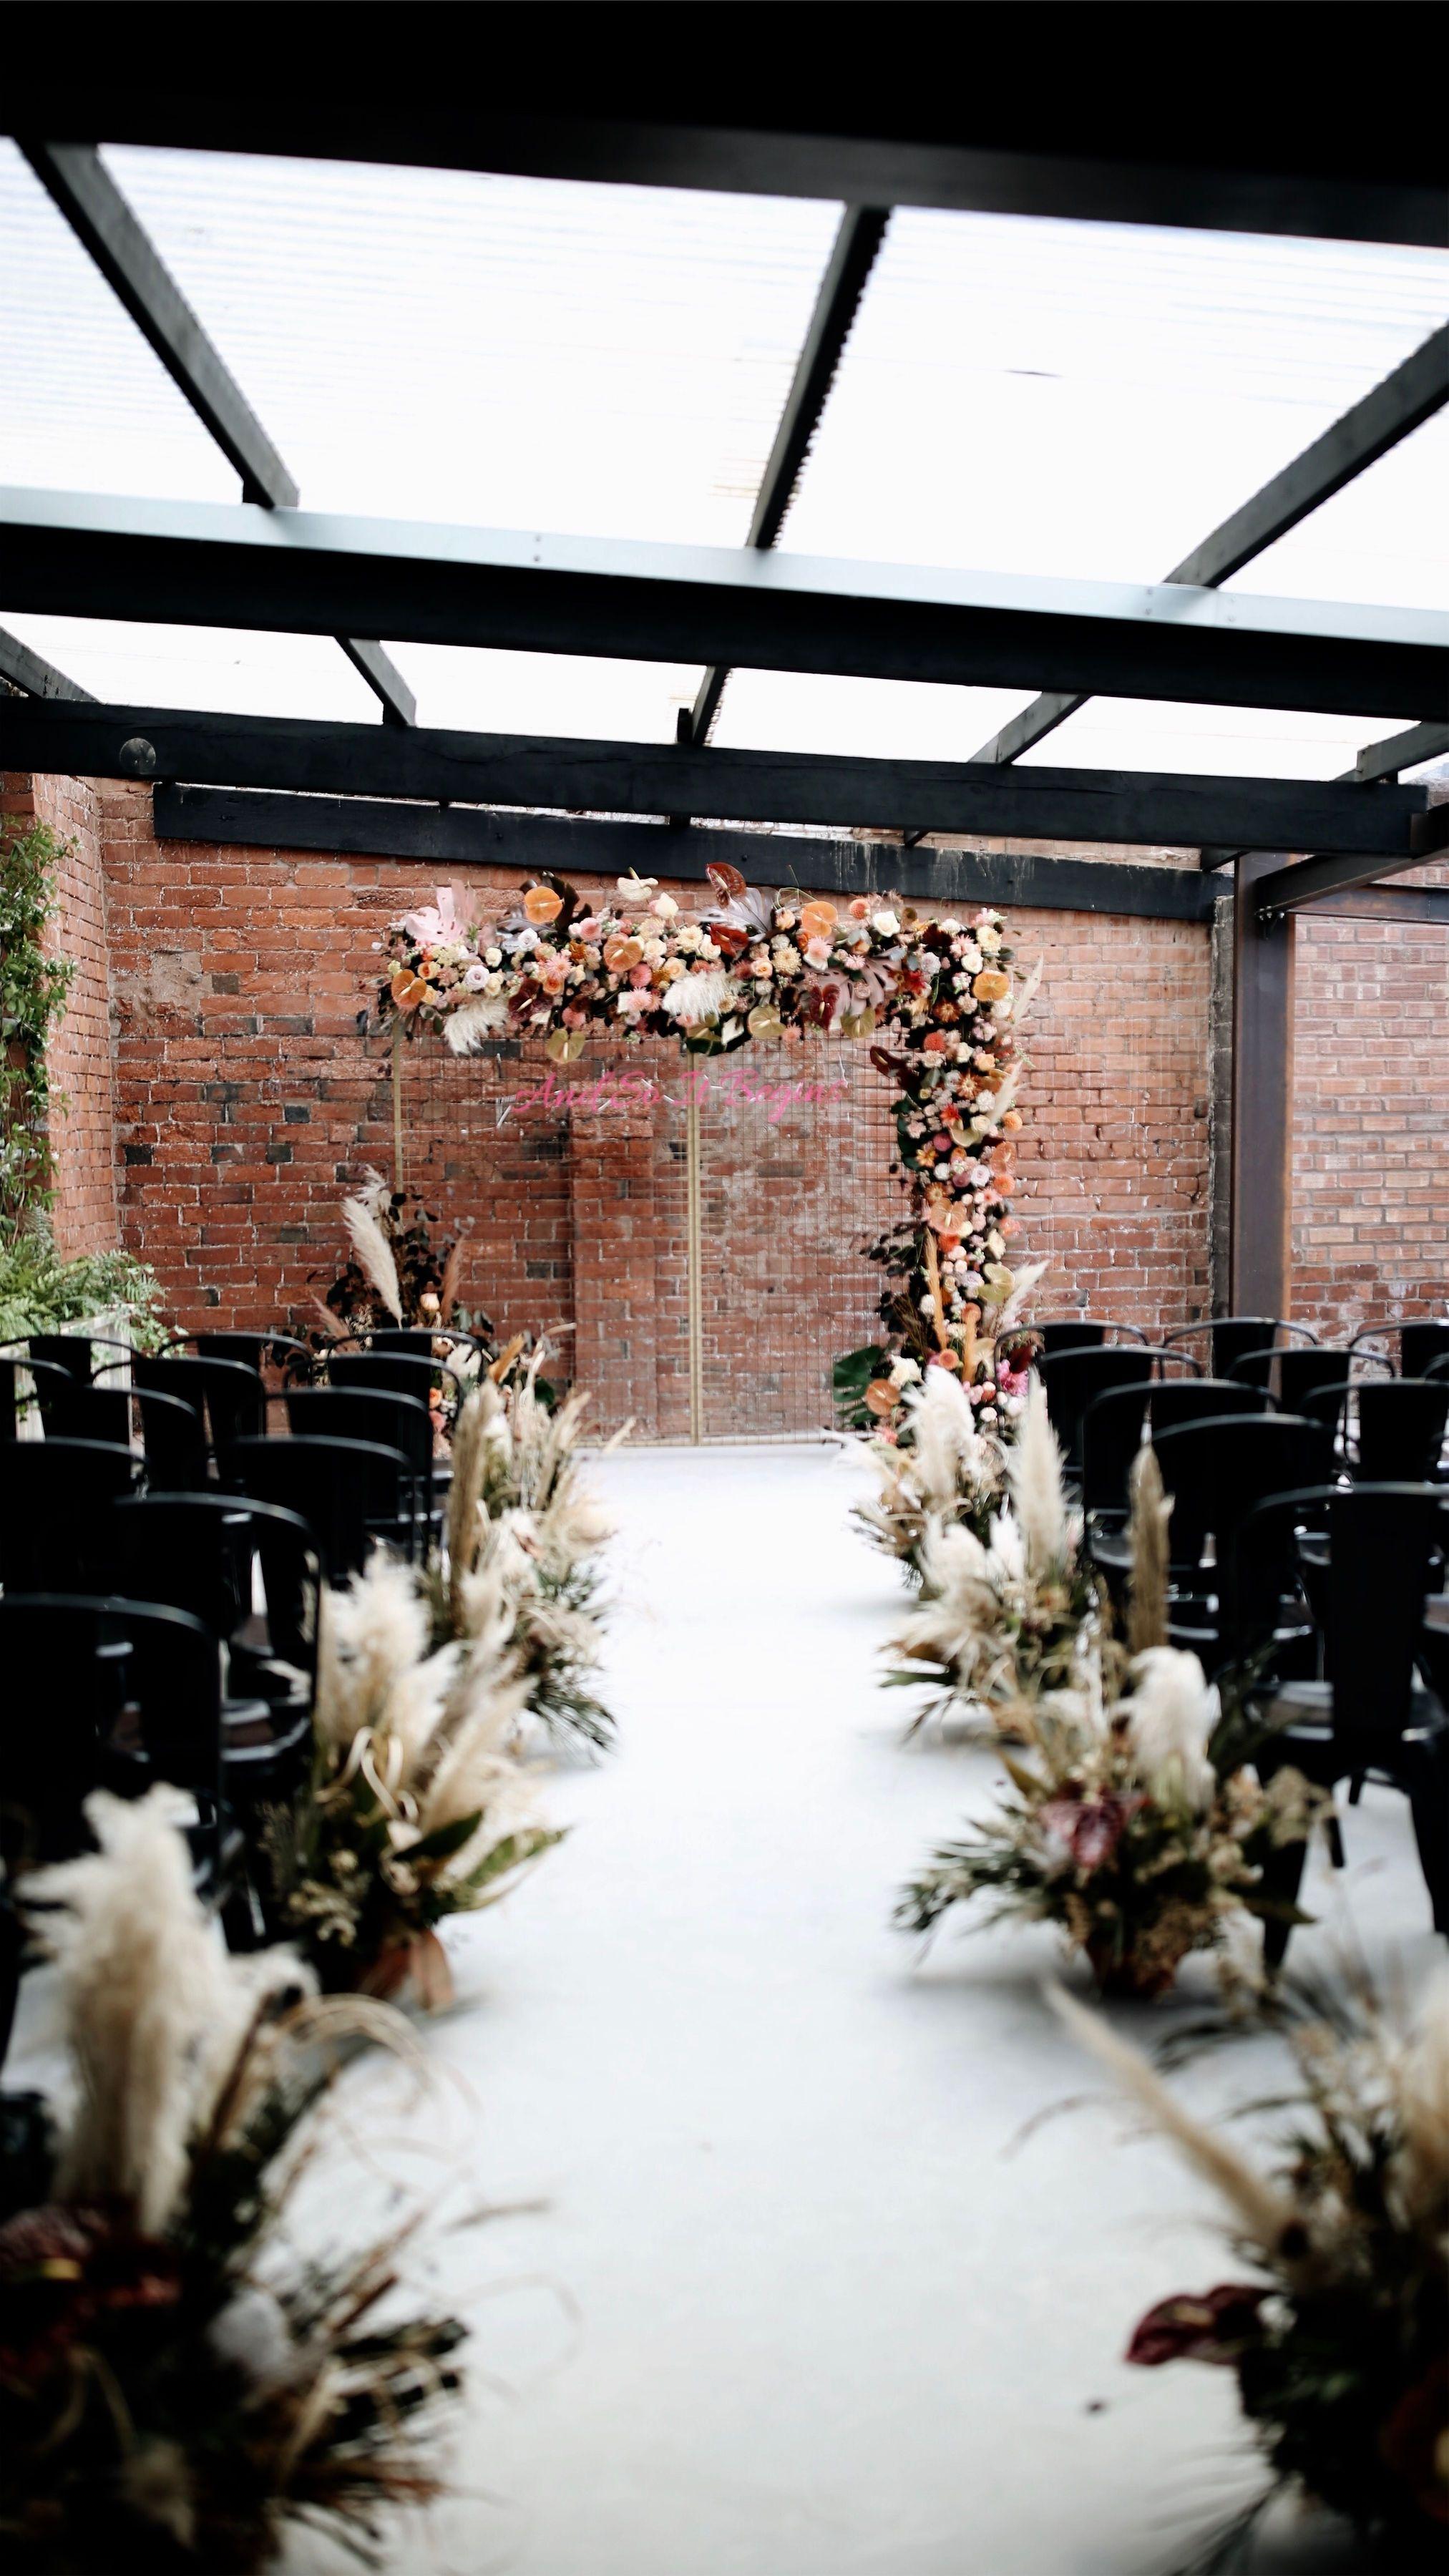 The Shack Revolution - Industrial Wedding Venue